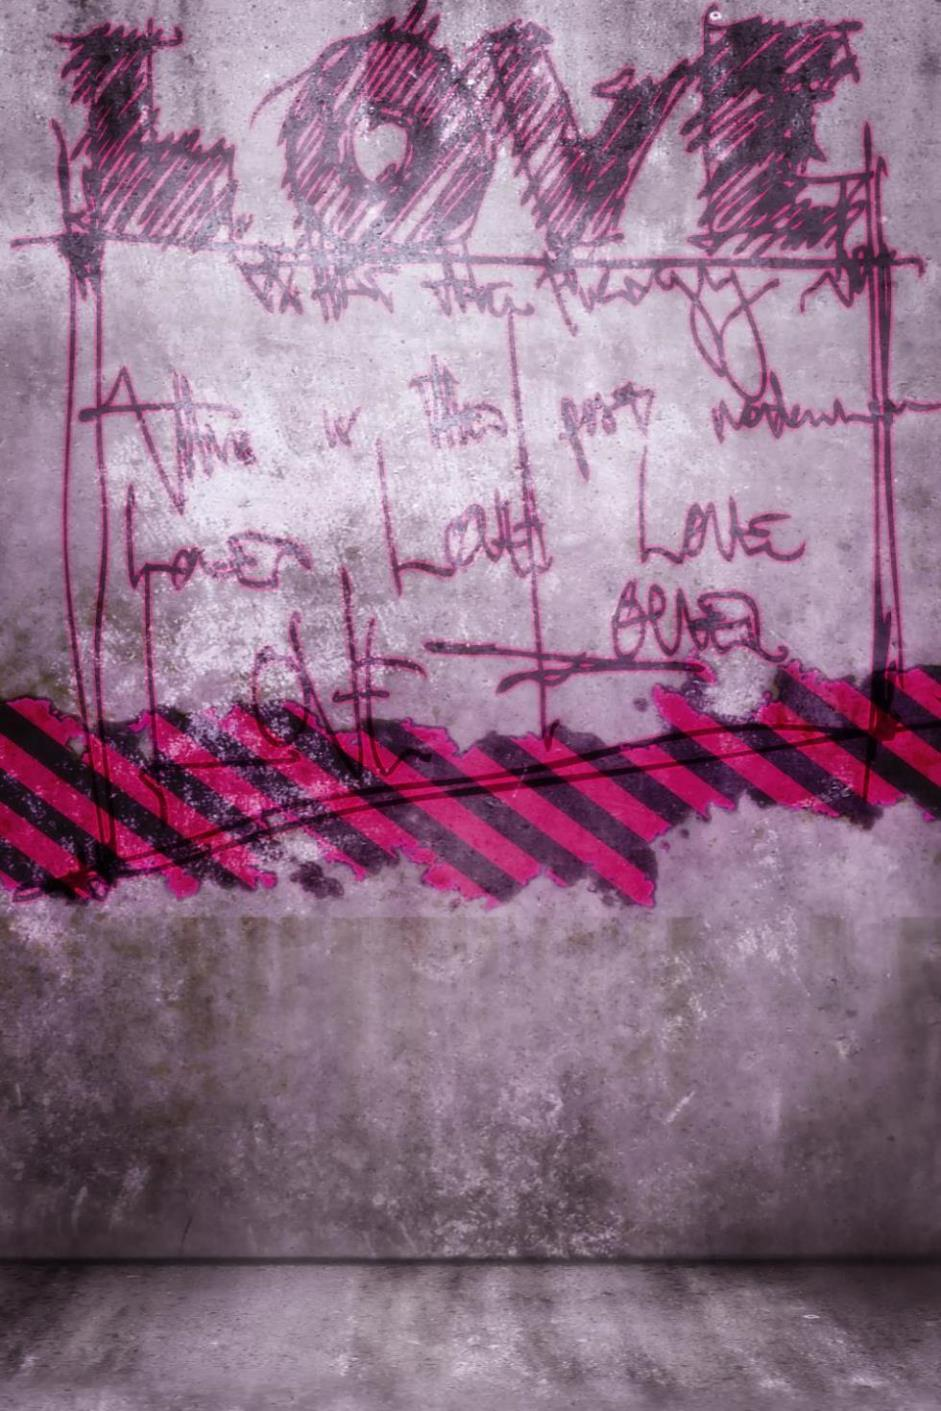 Graffiti wall vinyl - 200cm 150cm Photography Background Love Graffiti Wall Thick Cloth Backdrop Valentine S Day Zj China